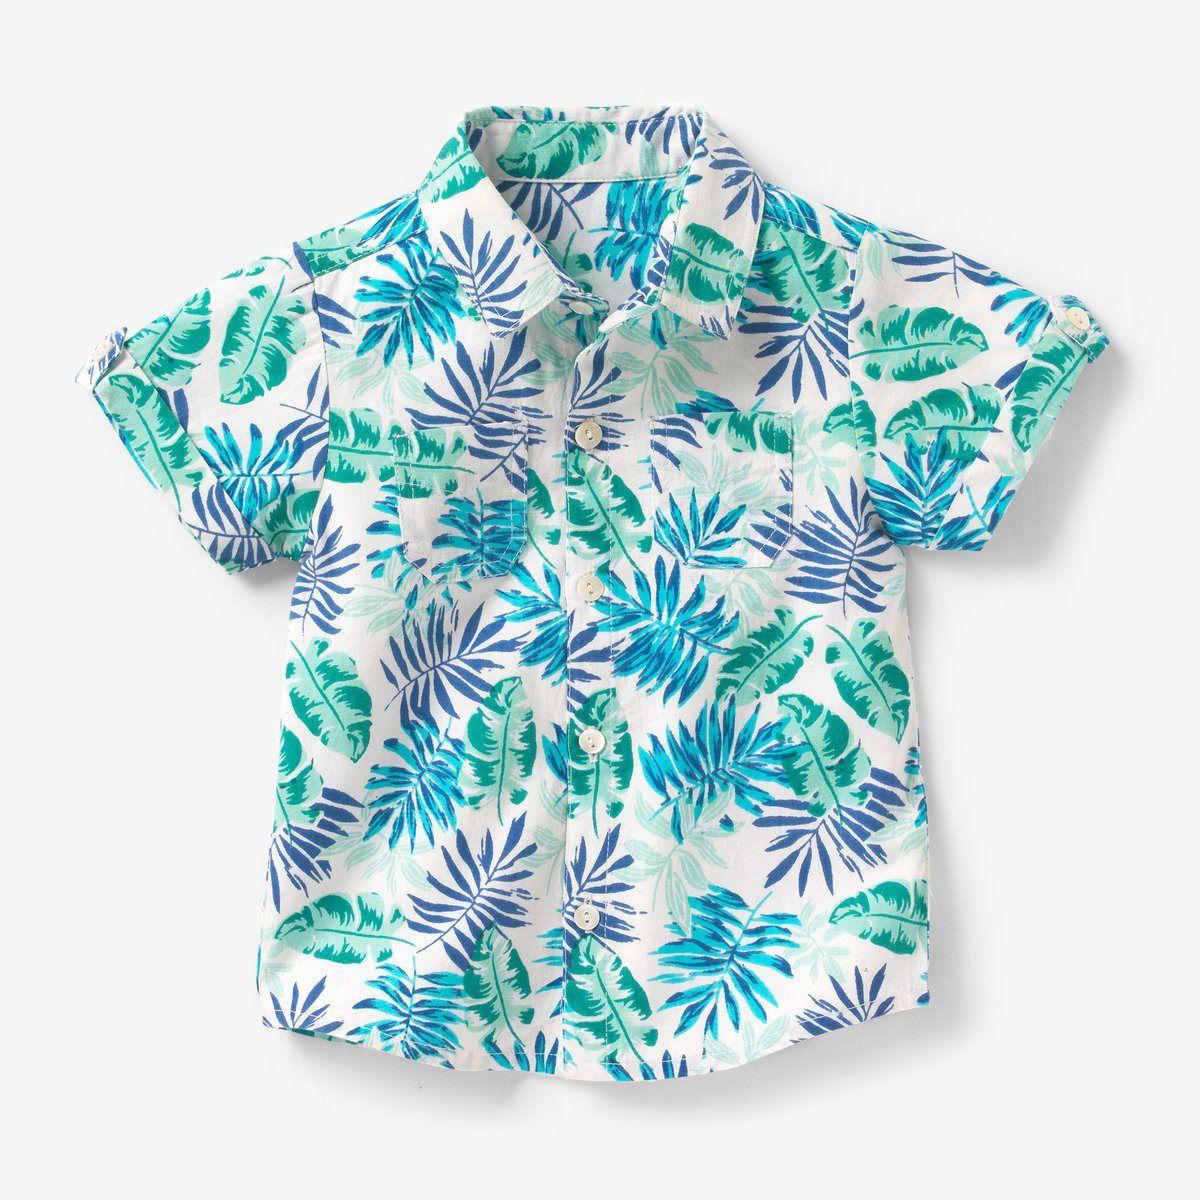 678f4359cf1 Short-sleeved floral print shirt R Baby   La Redoute   prints   Boys ...